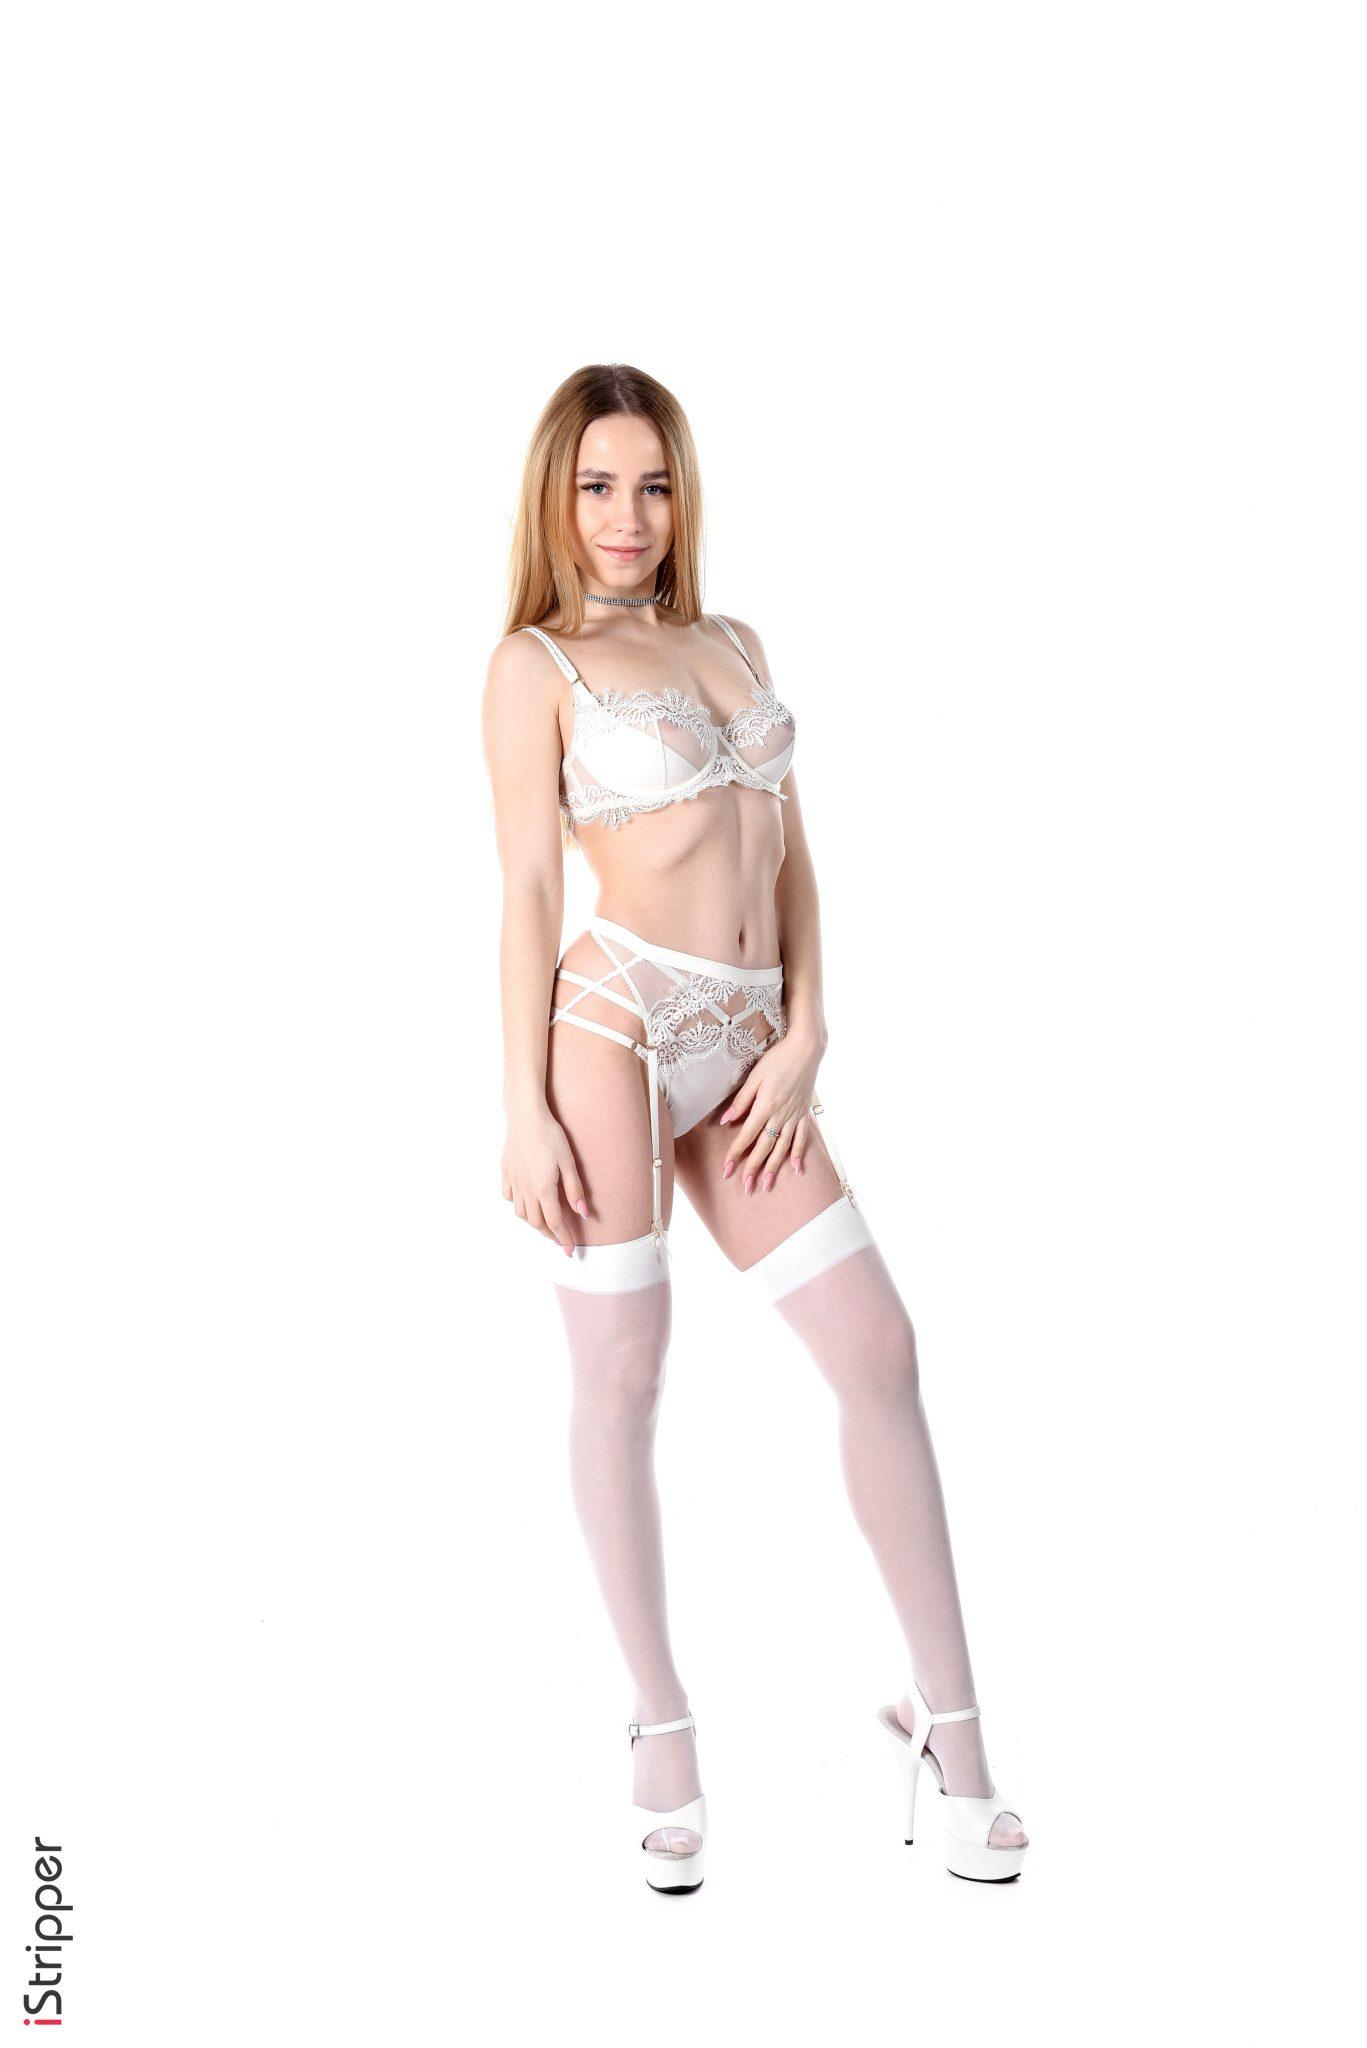 Sexy Blond Model Watch Bonnie Parker Strip Tease Naked (1)